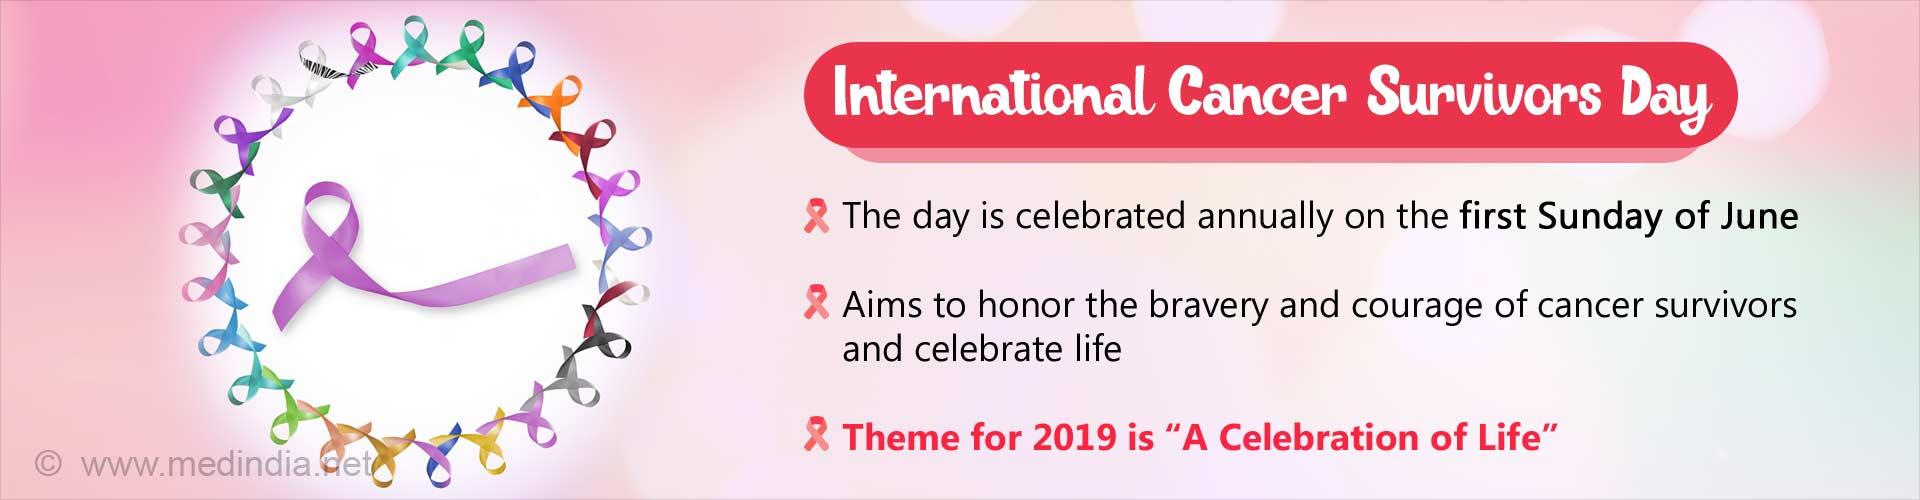 Celebrate and Support Cancer Survivors on International Cancer Survivors Day